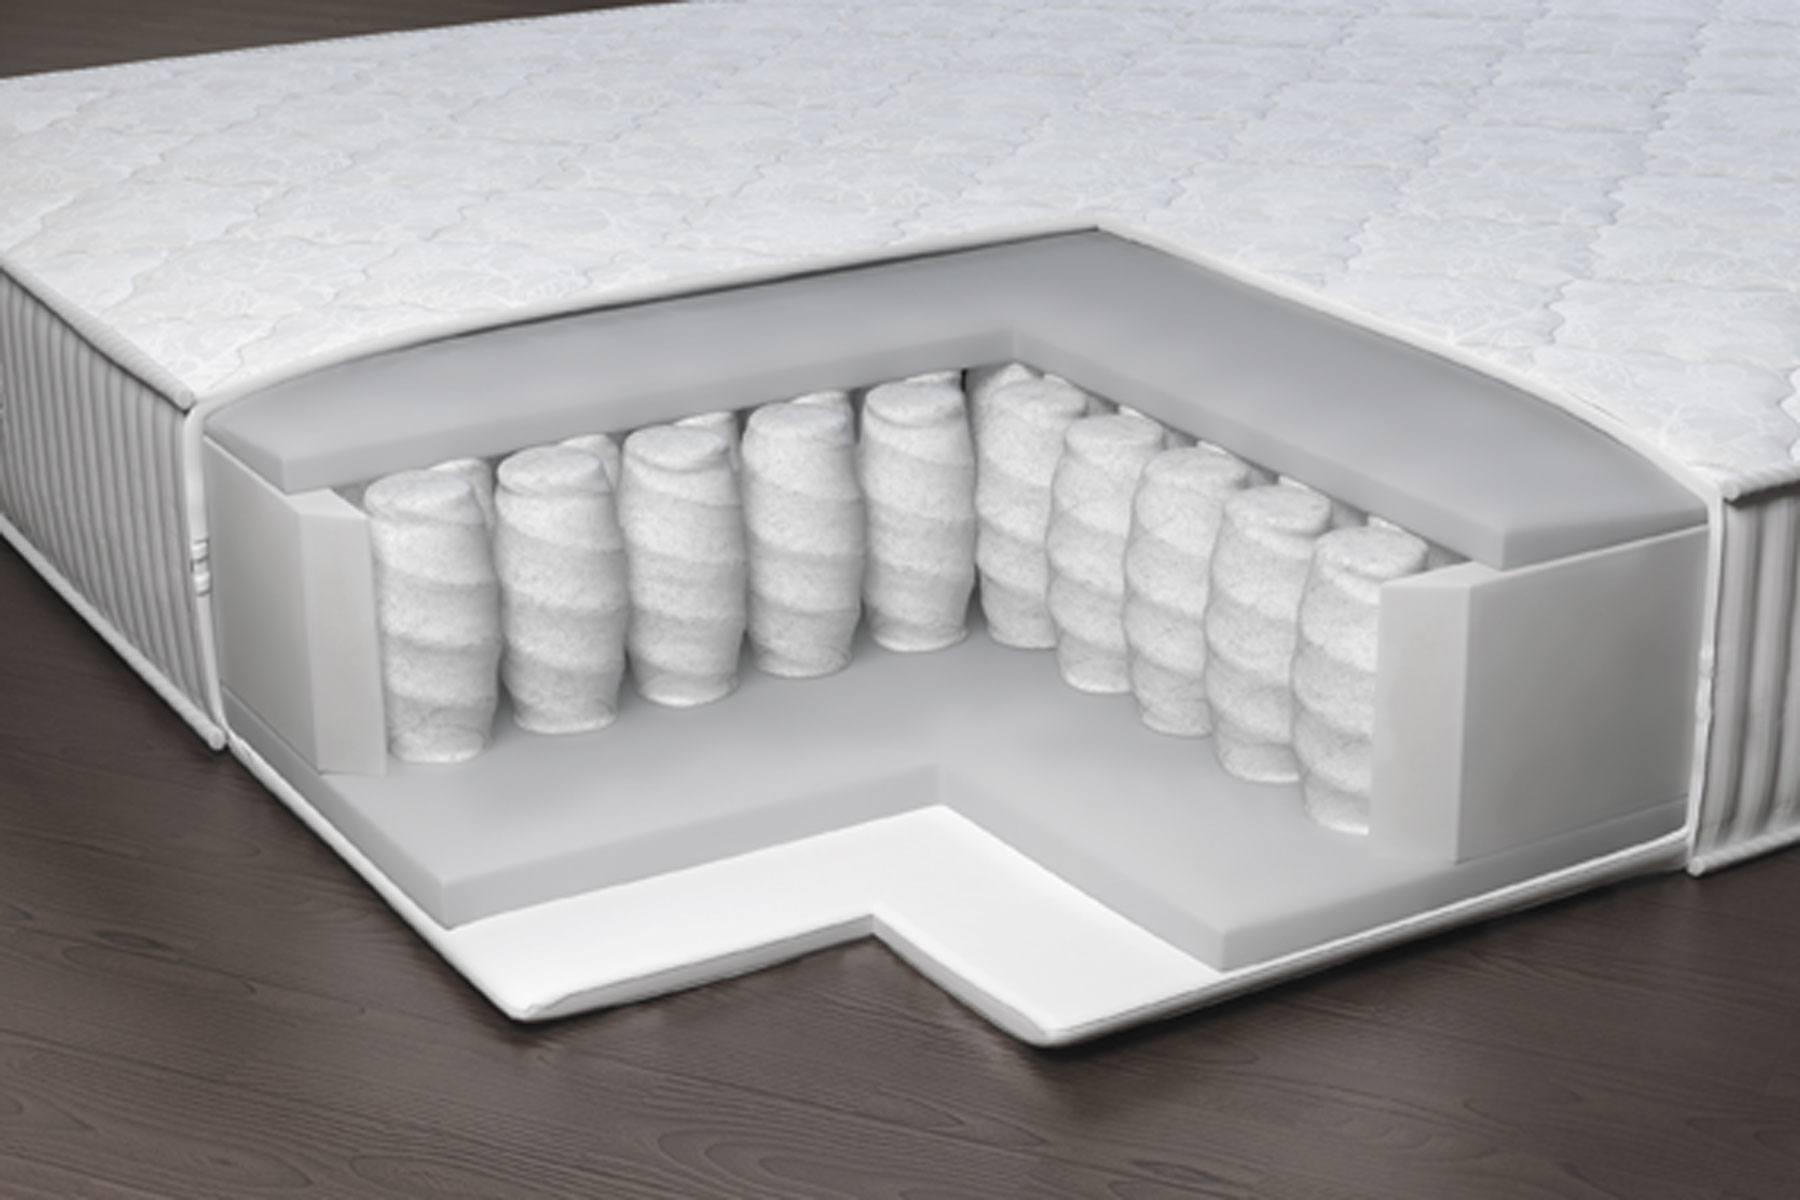 столешницы для кухни из пластика плюсы и минусы